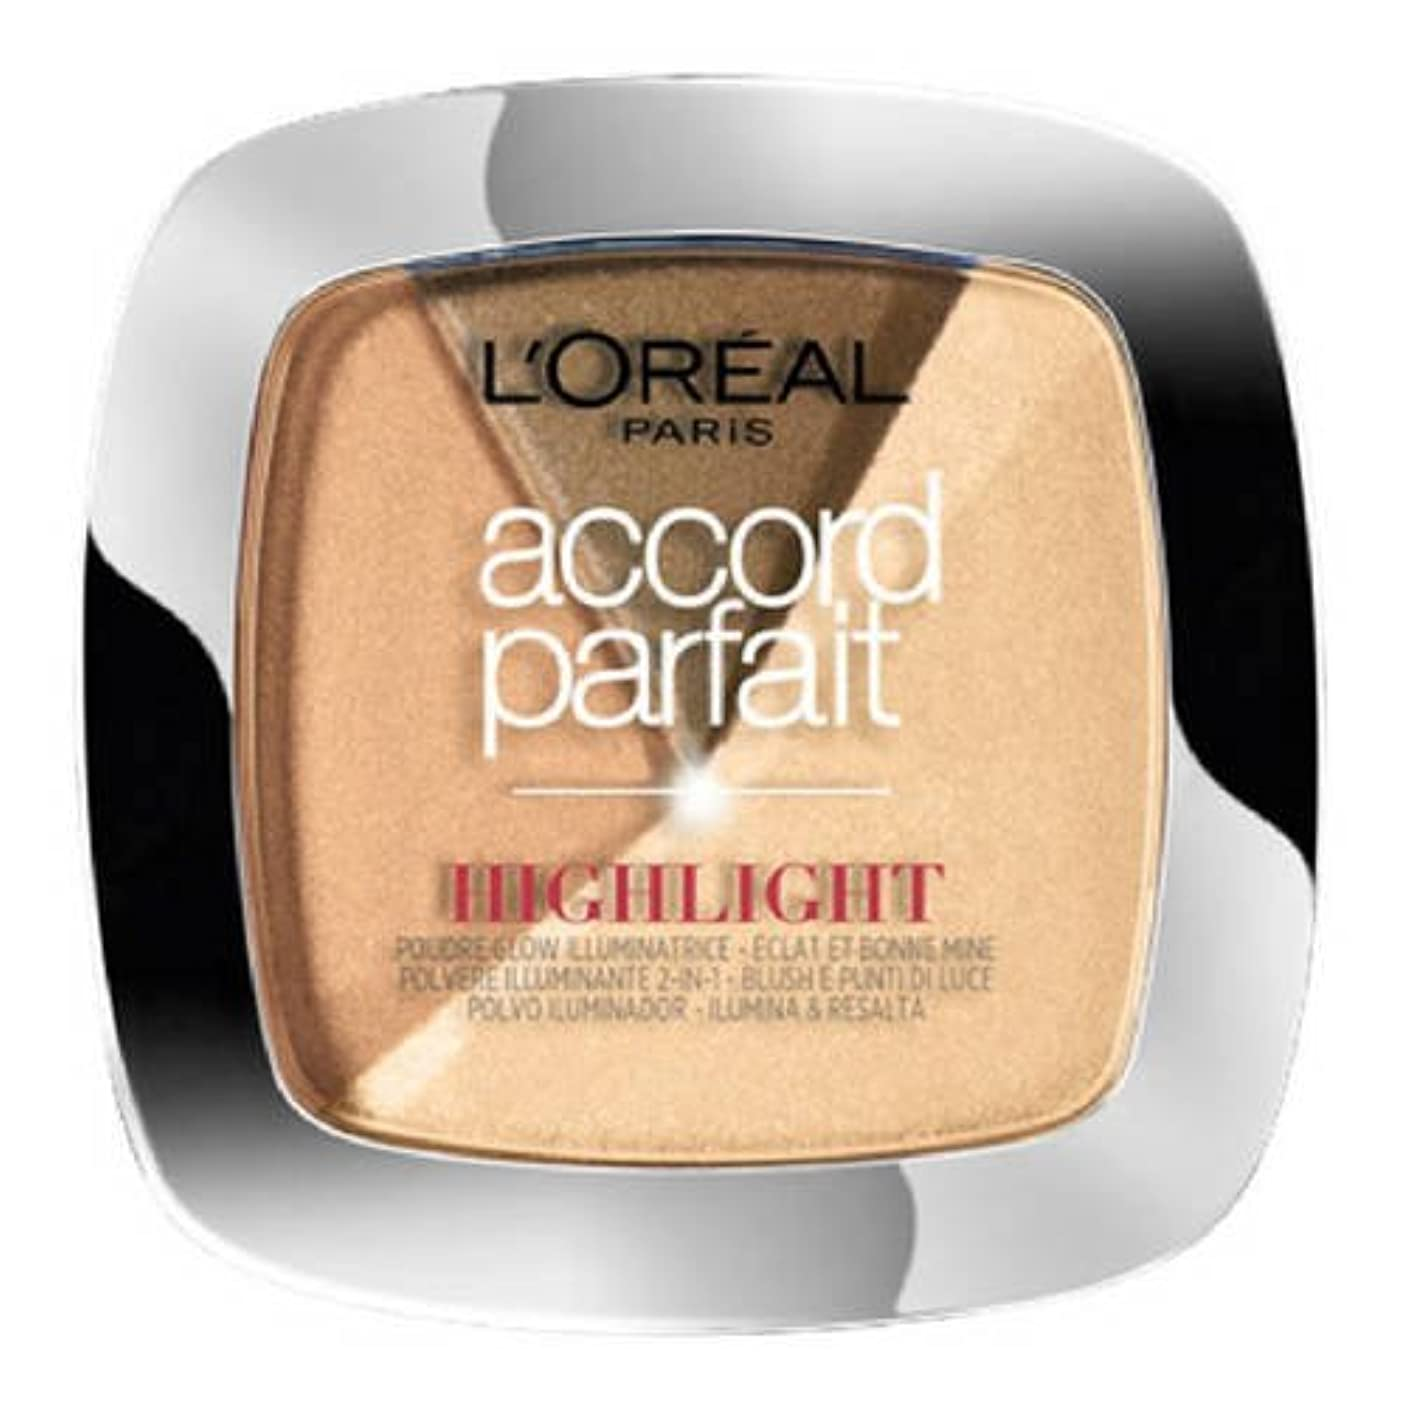 第四美徳助言L 'Oréal Paris - ACCORD PARFAIT Highlight Enlumineur Poudre - 102 Dore